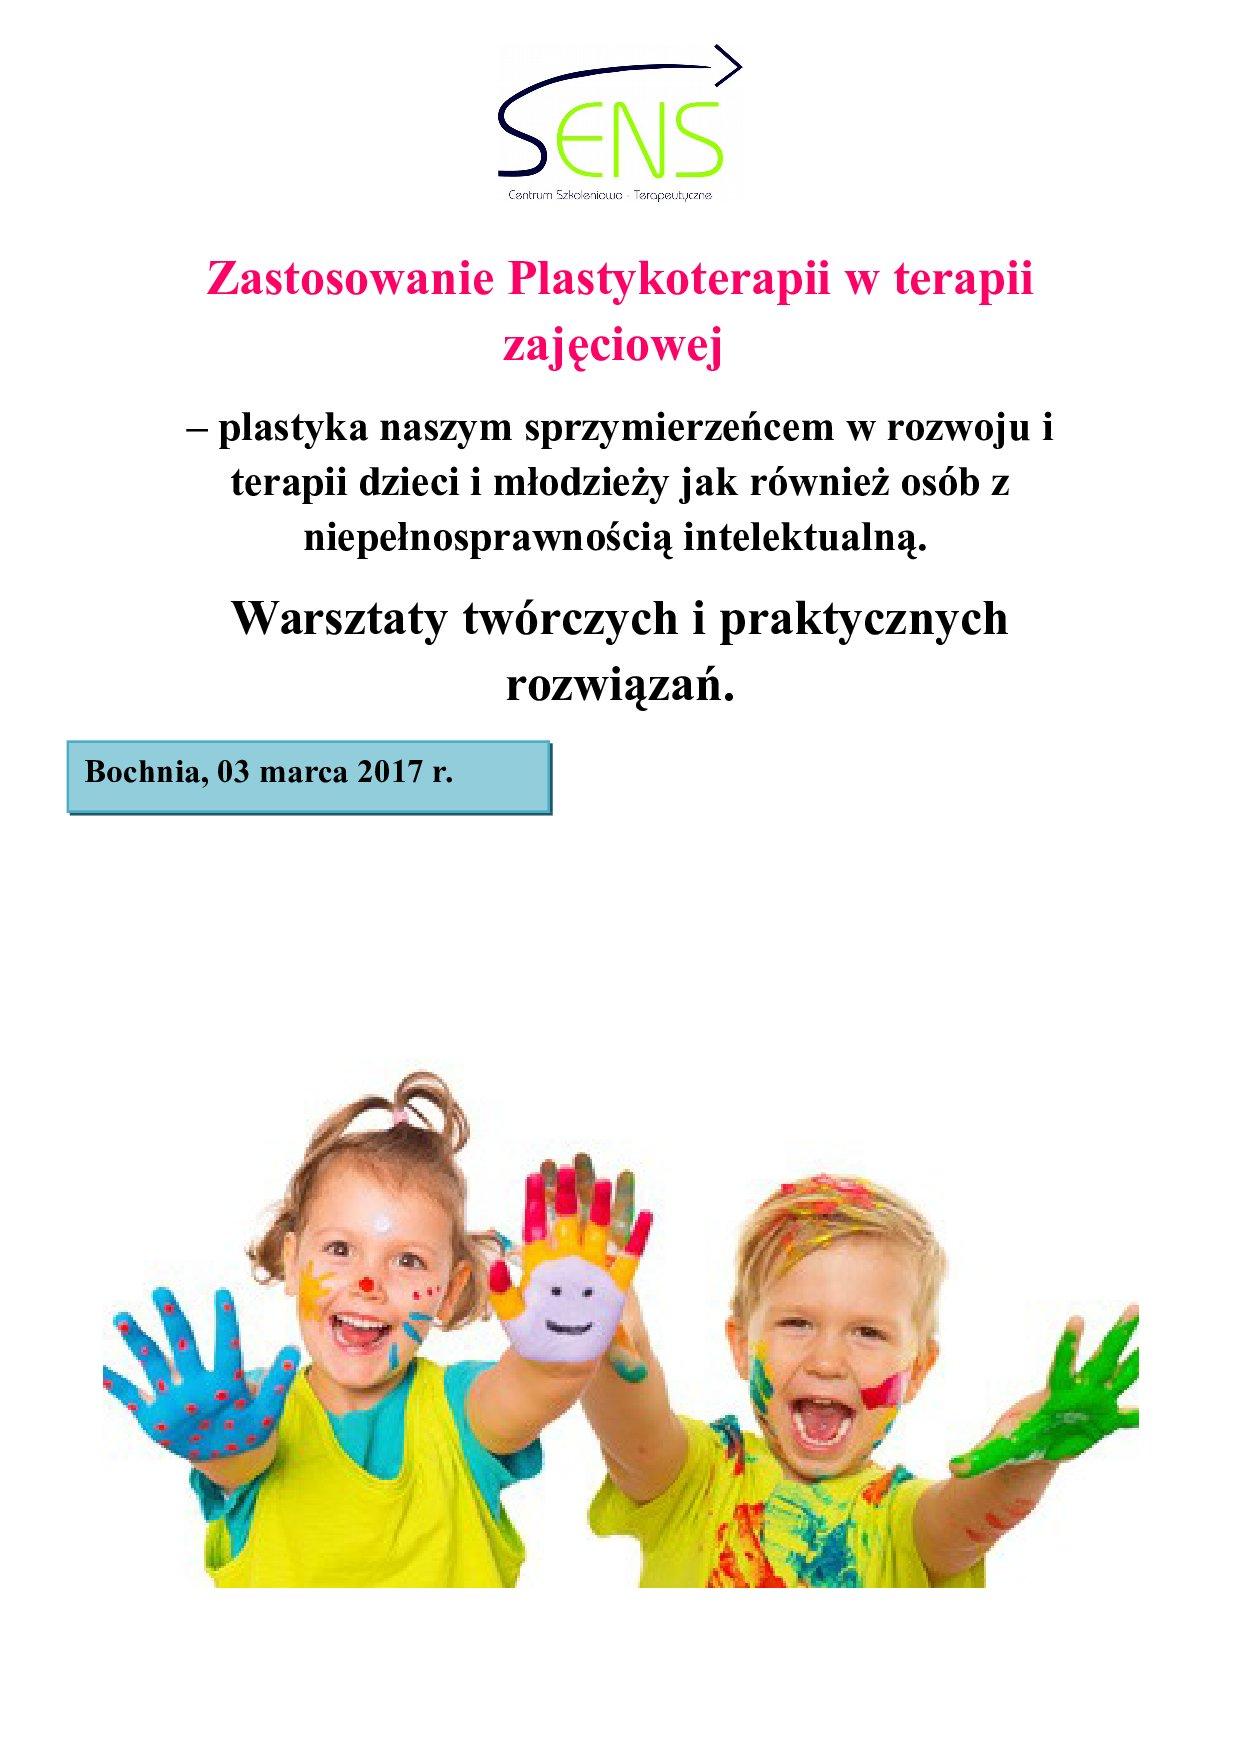 Bochnia. Plastykoterapia. 03.03.2017 r.